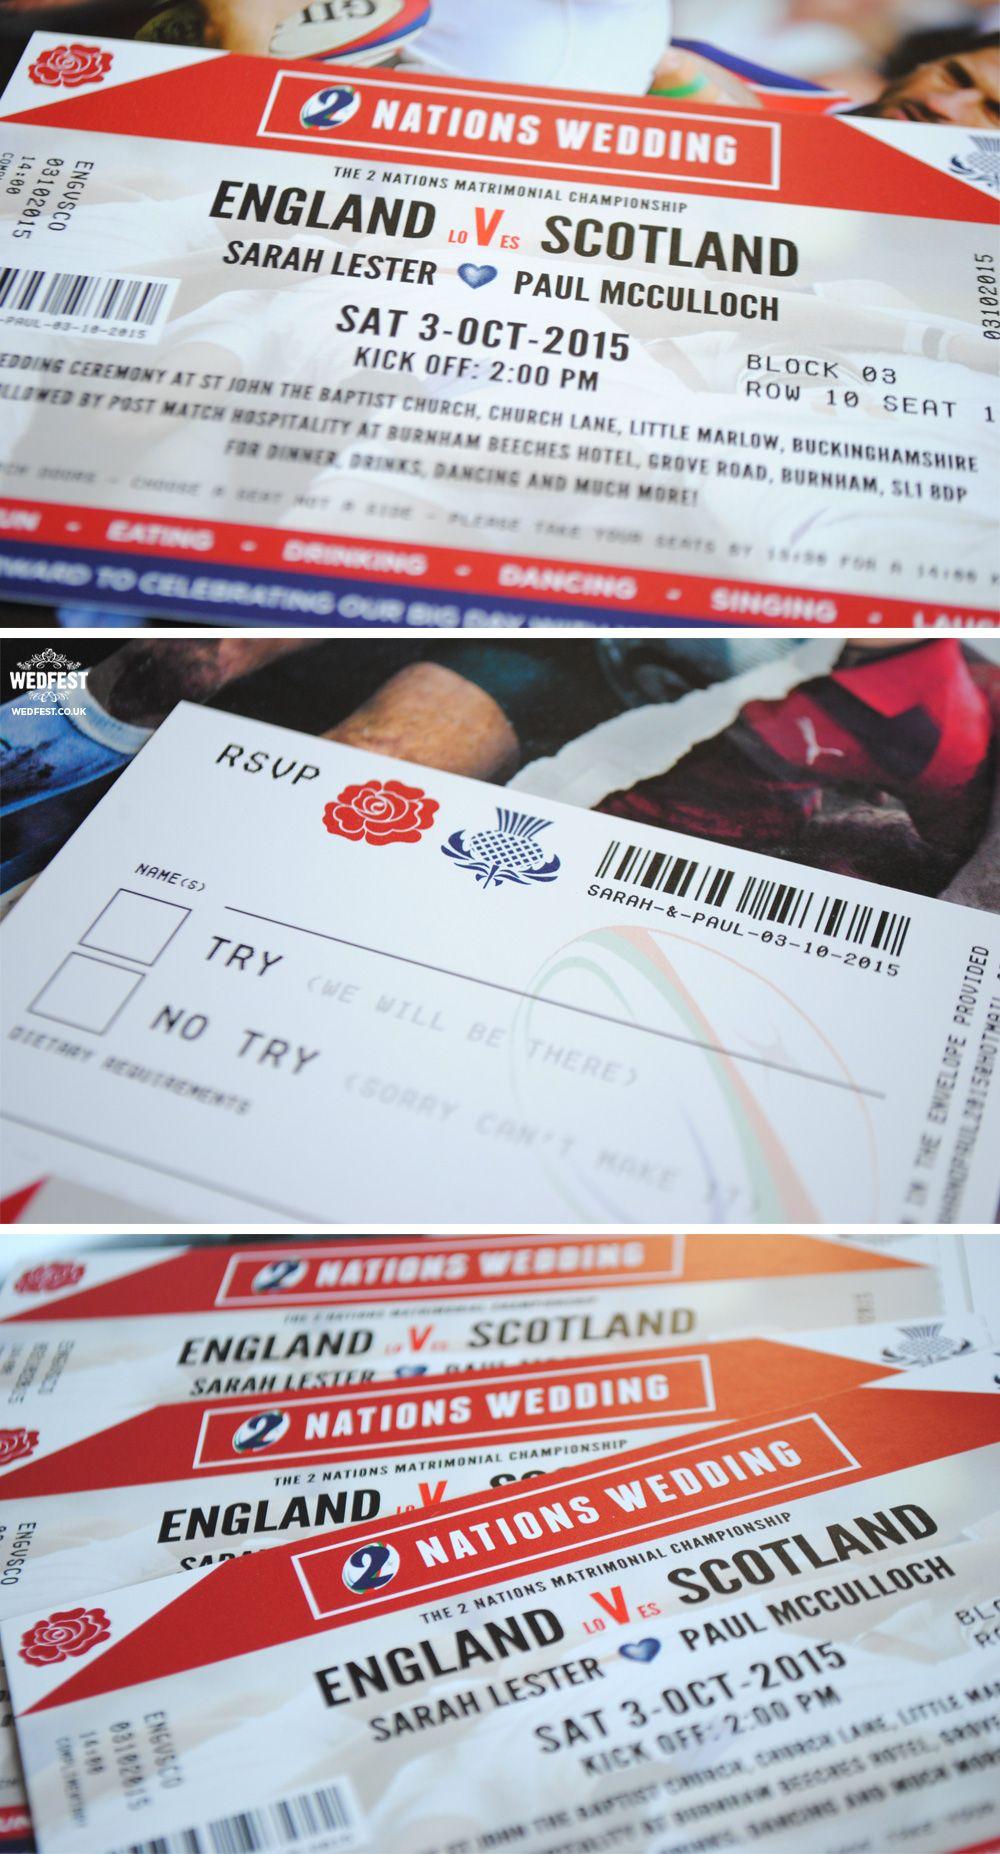 Scotland V England Rugby Wedding Invitation Http Www Wedfest Co